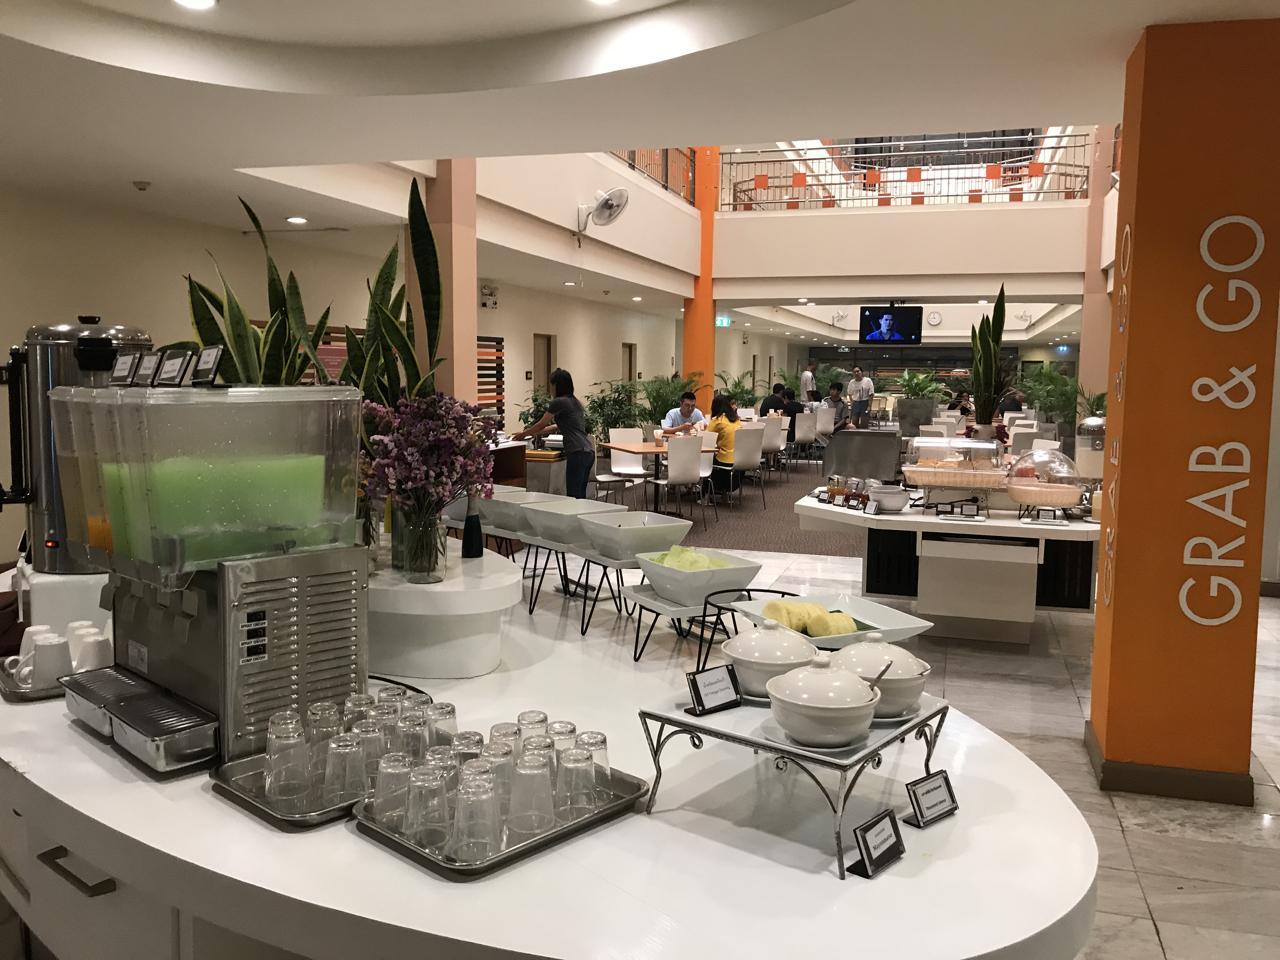 Residents at the Imm Hotel in Chiang Mai have breakfast. Chiang Mai hotels saw occupancy rates drop to 70% this November. Karnjana Karnjanatawe